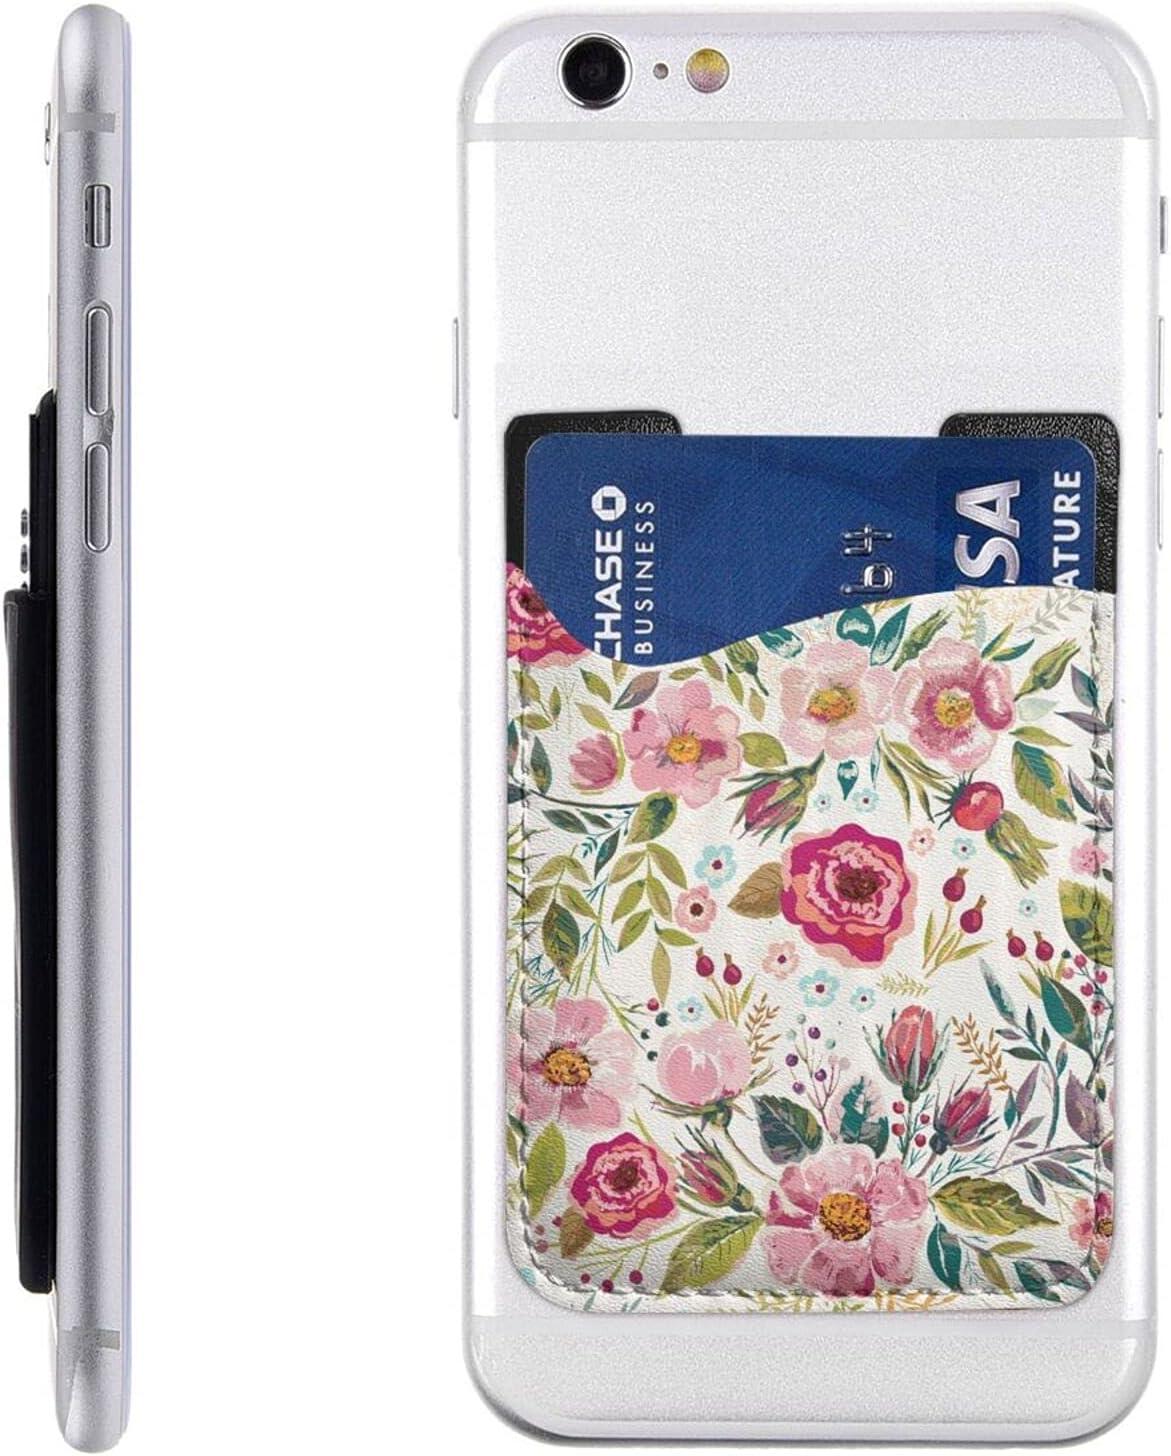 Flower Leaf Phone Card free Holder Wallet Cell Sl Very popular On Stick